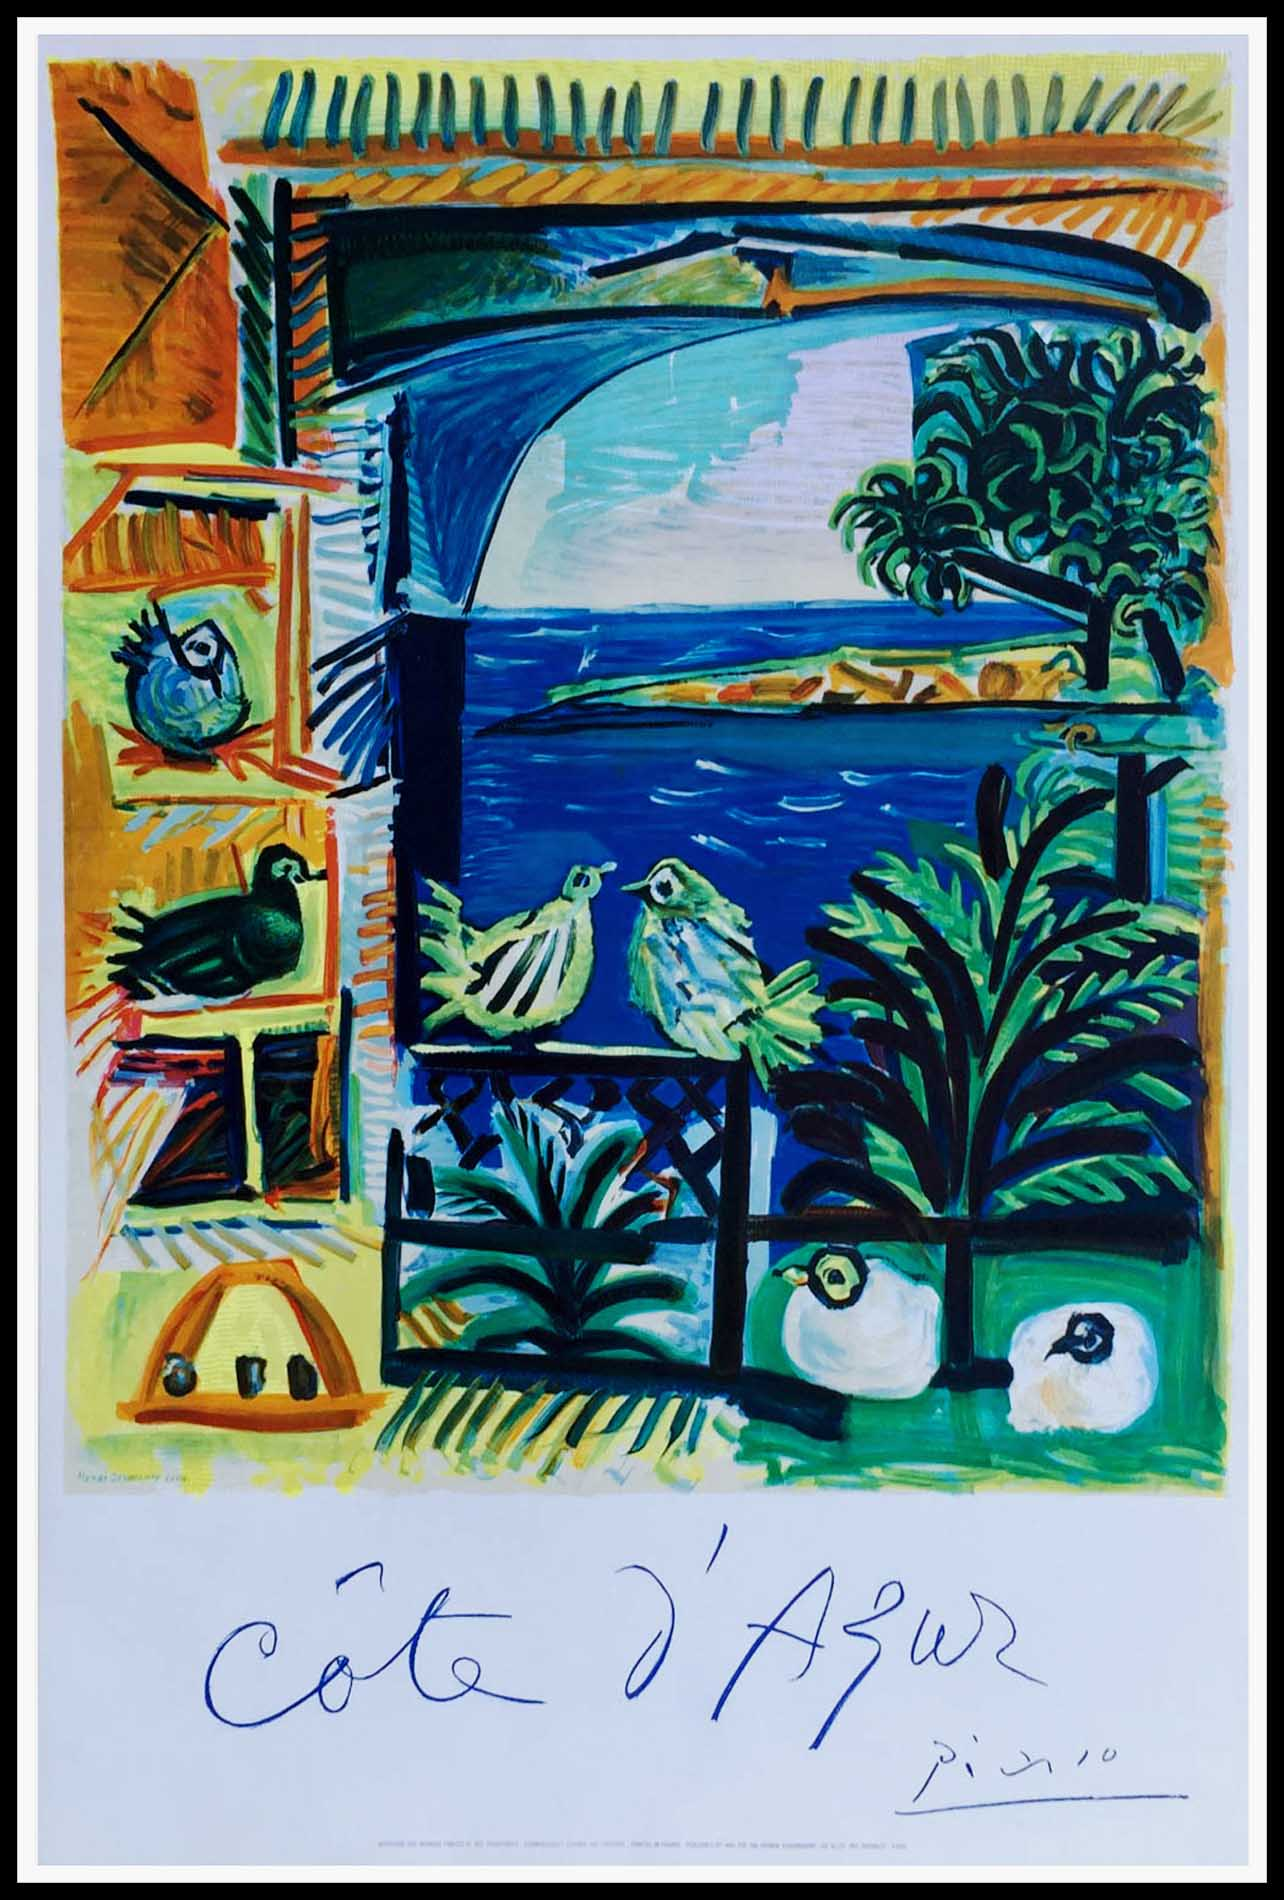 "(alt=""original vintage poster, Côte d'Azur, Saint Tropez, Cannes, Nice, signed in the plate PICASSO printed MOURLOT 1962"")"